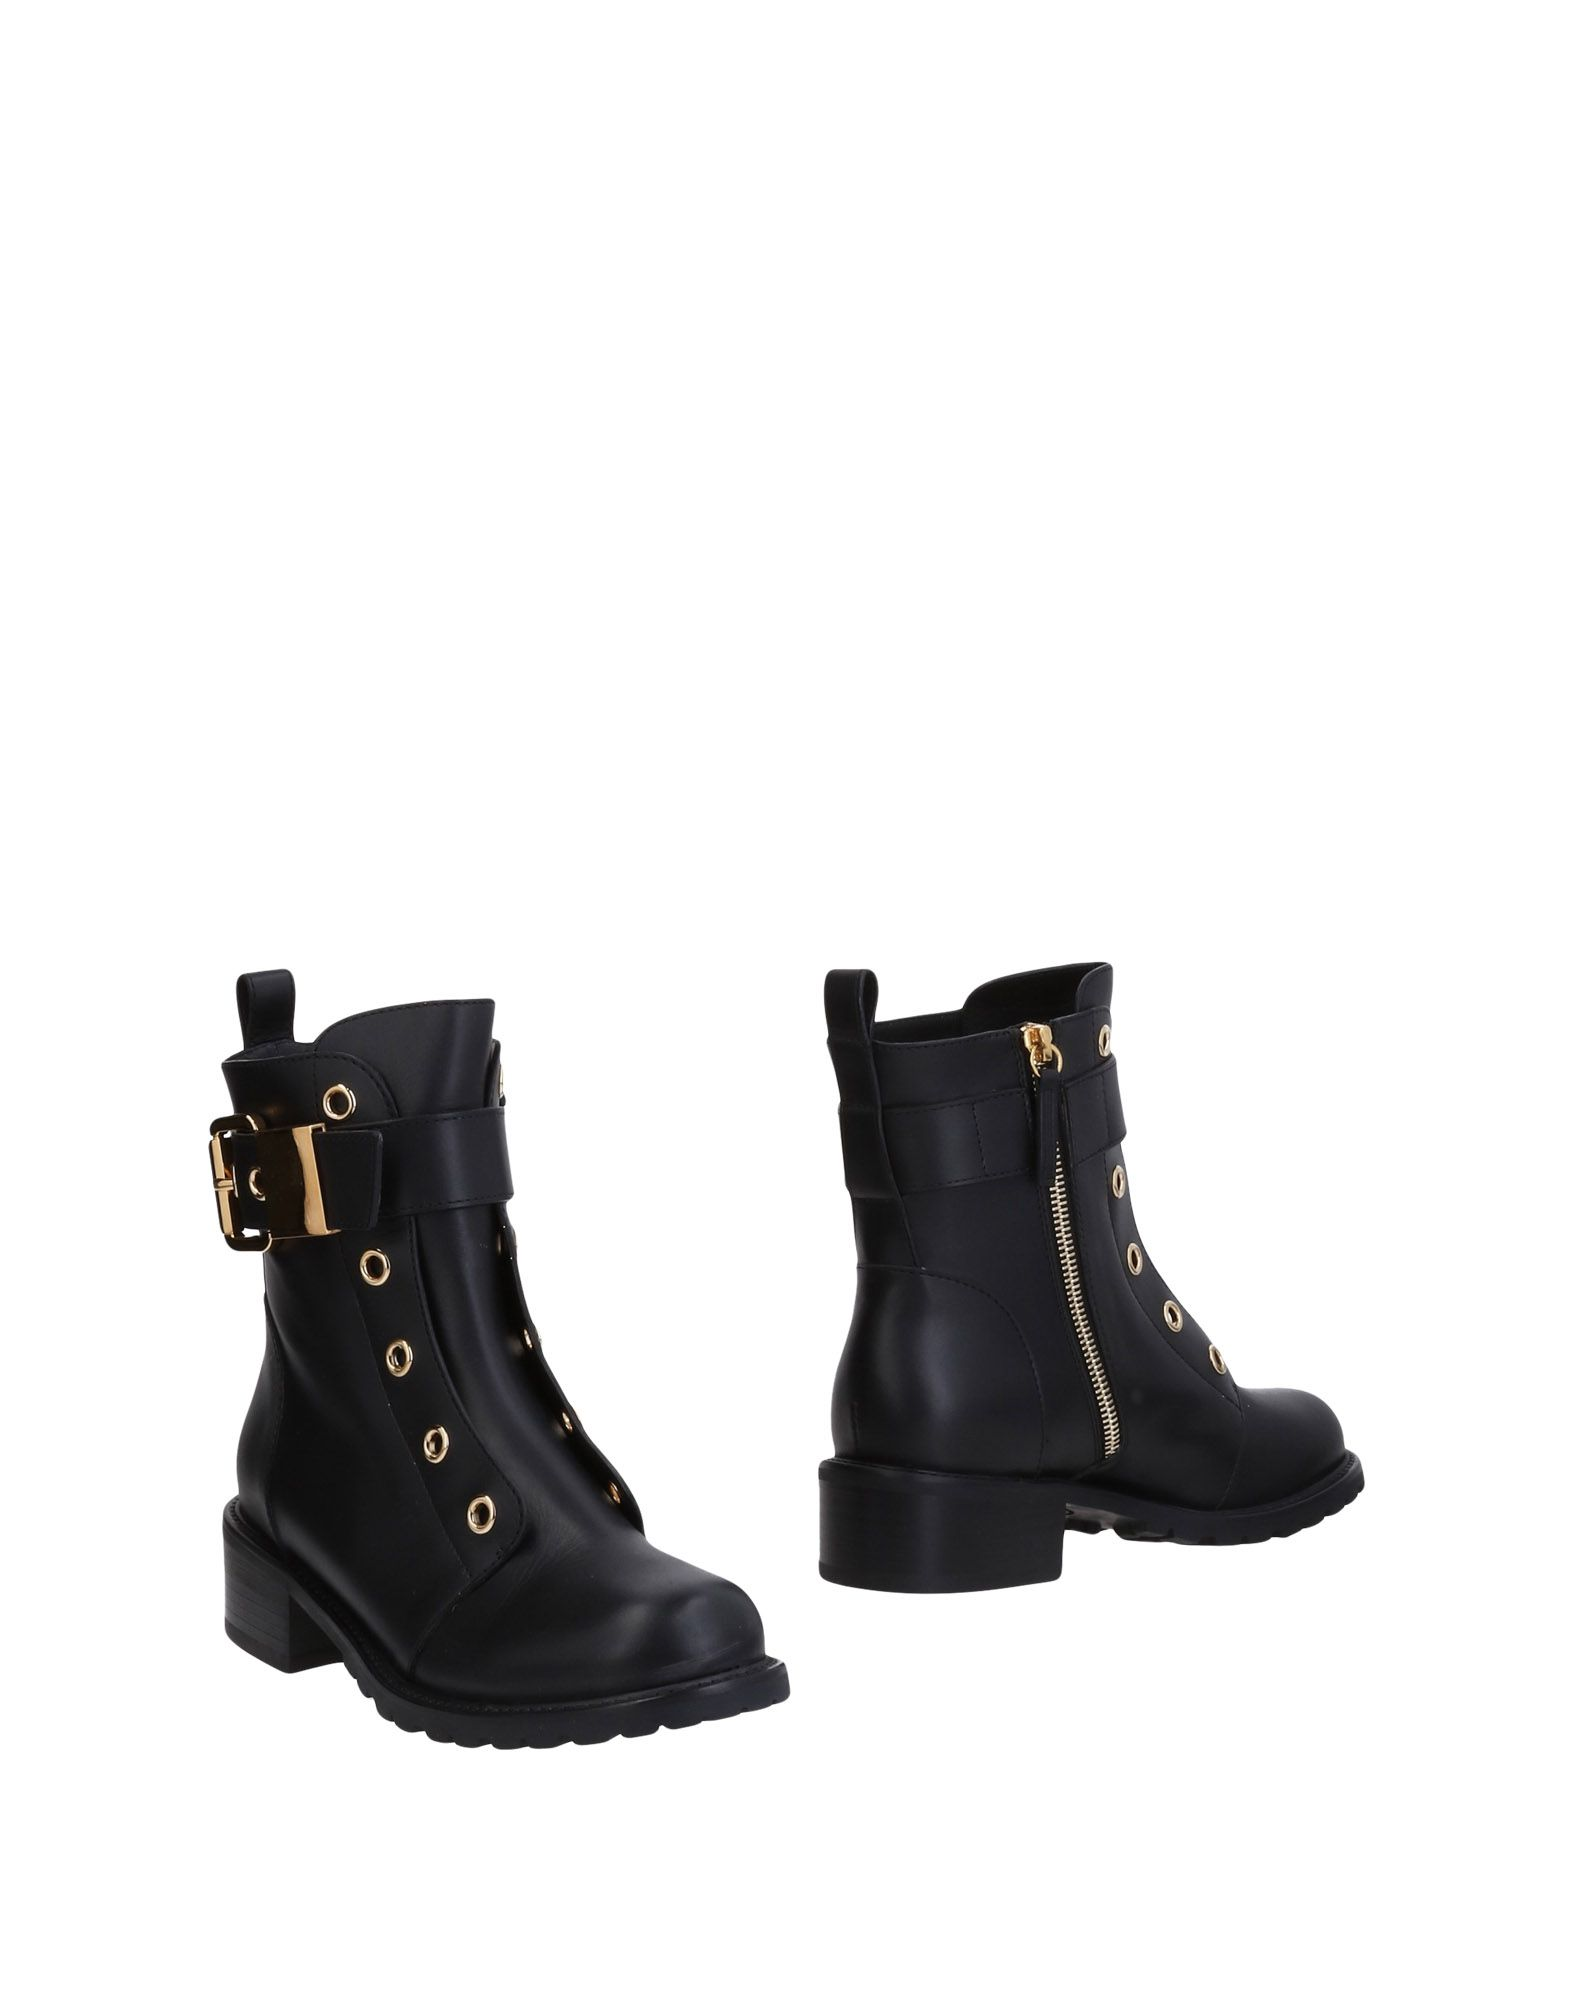 Giuseppe Zanotti Stiefelette Damen Schuhe  11460942MSGünstige gut aussehende Schuhe Damen 98194c